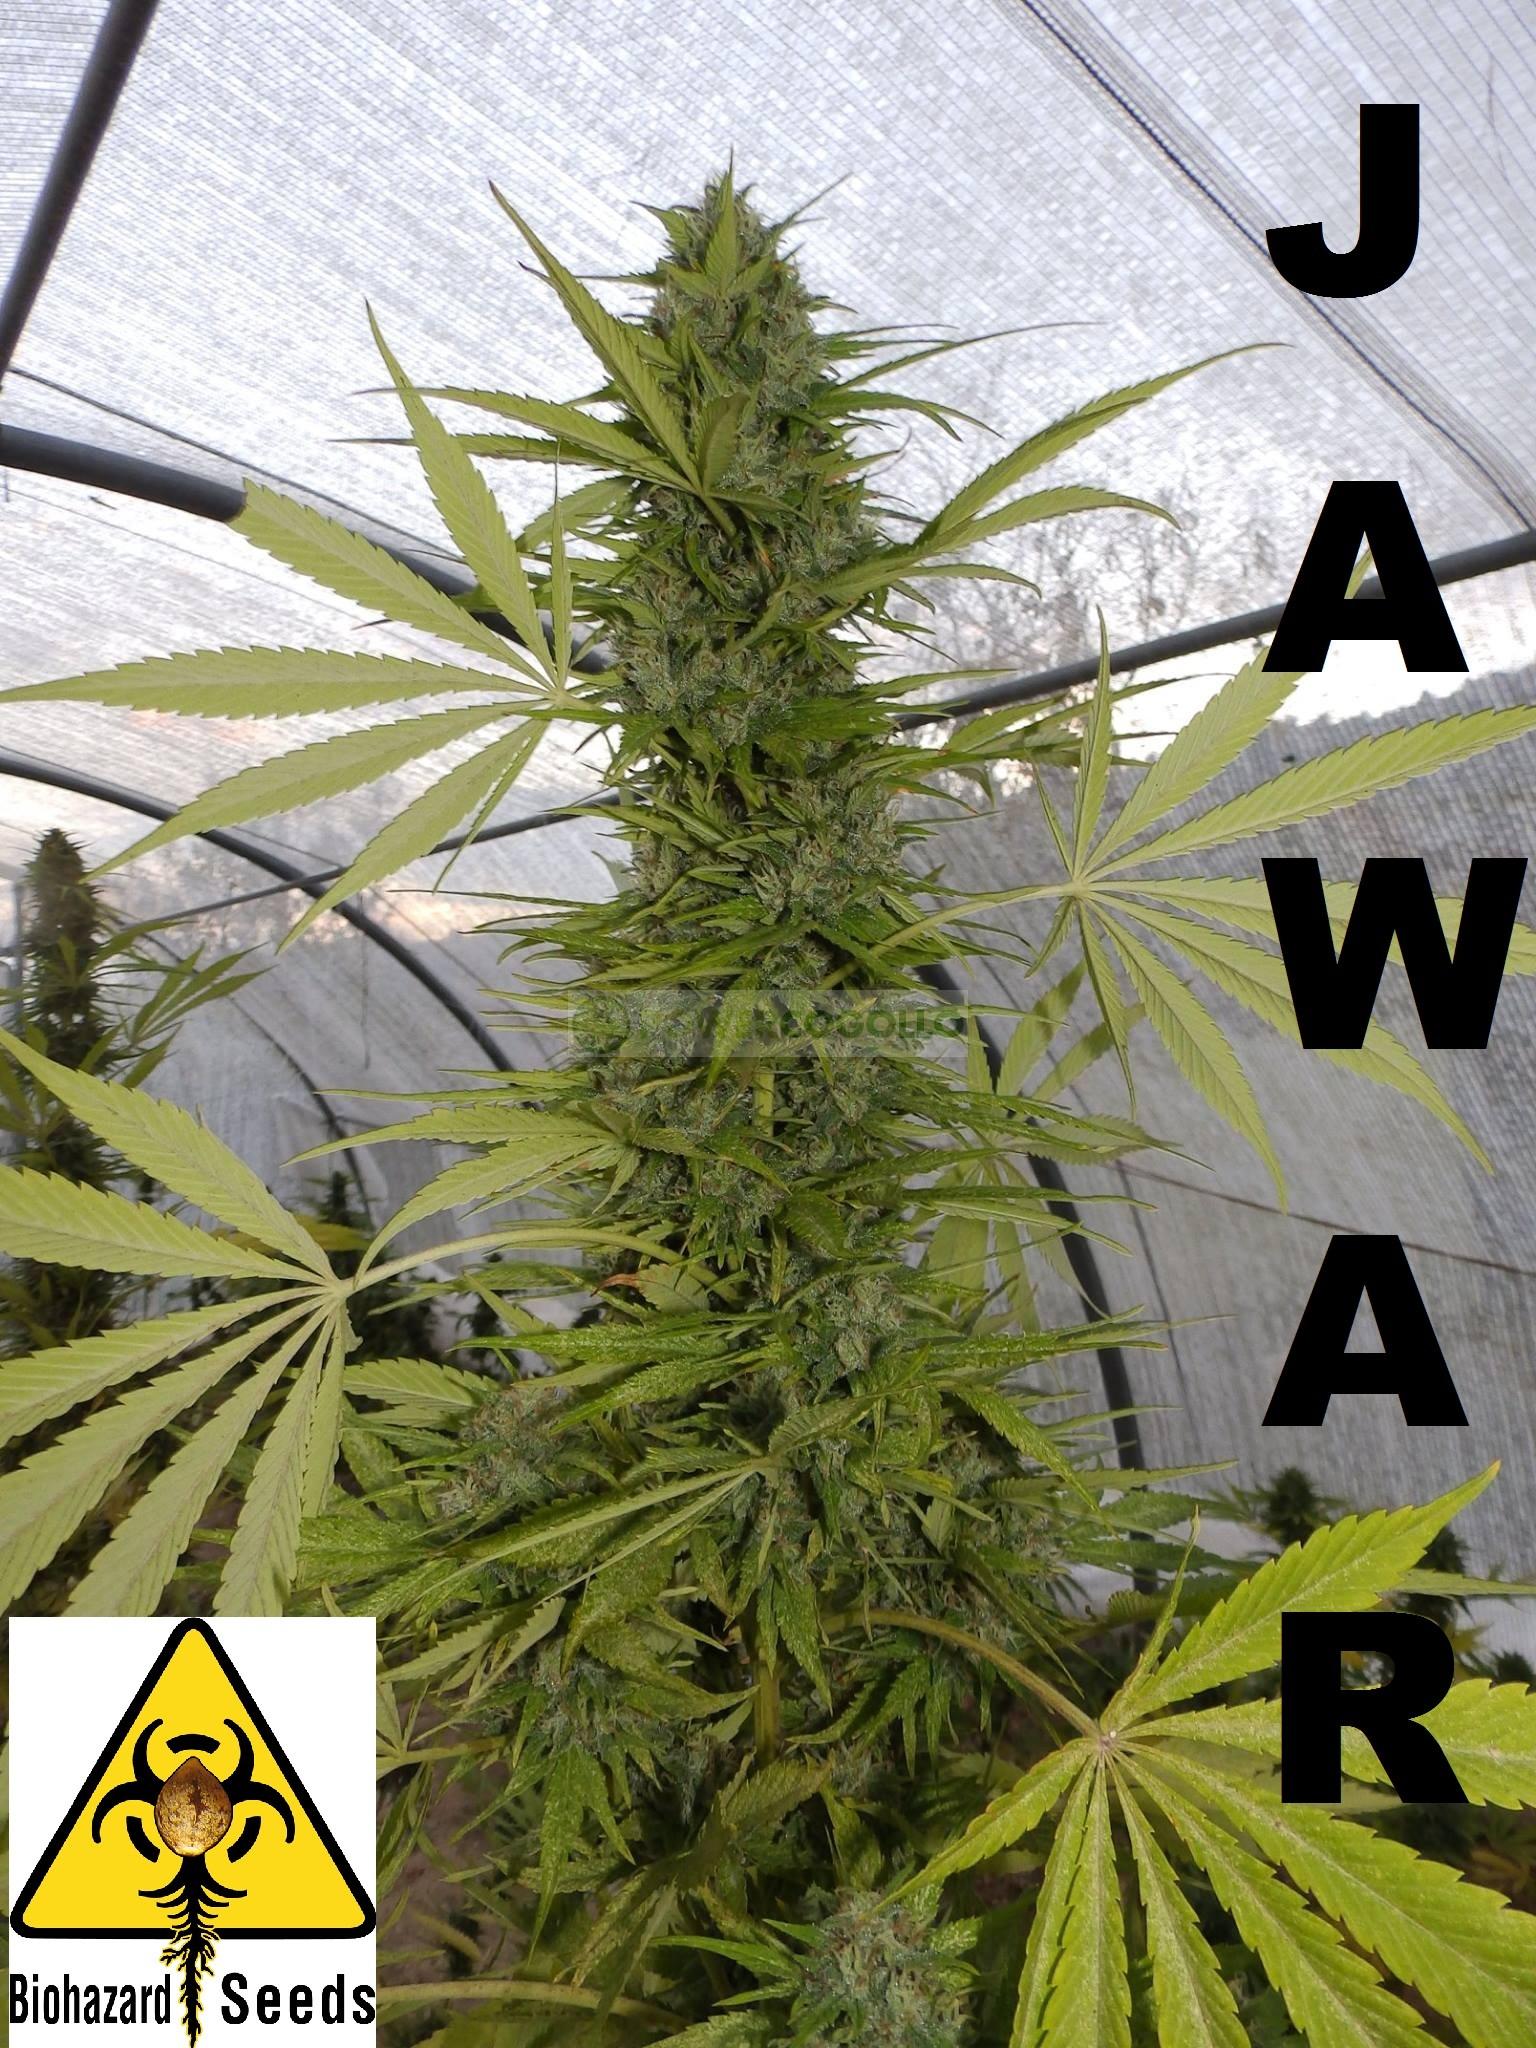 Jawar (Biohazard Seeds) Feminizada 1